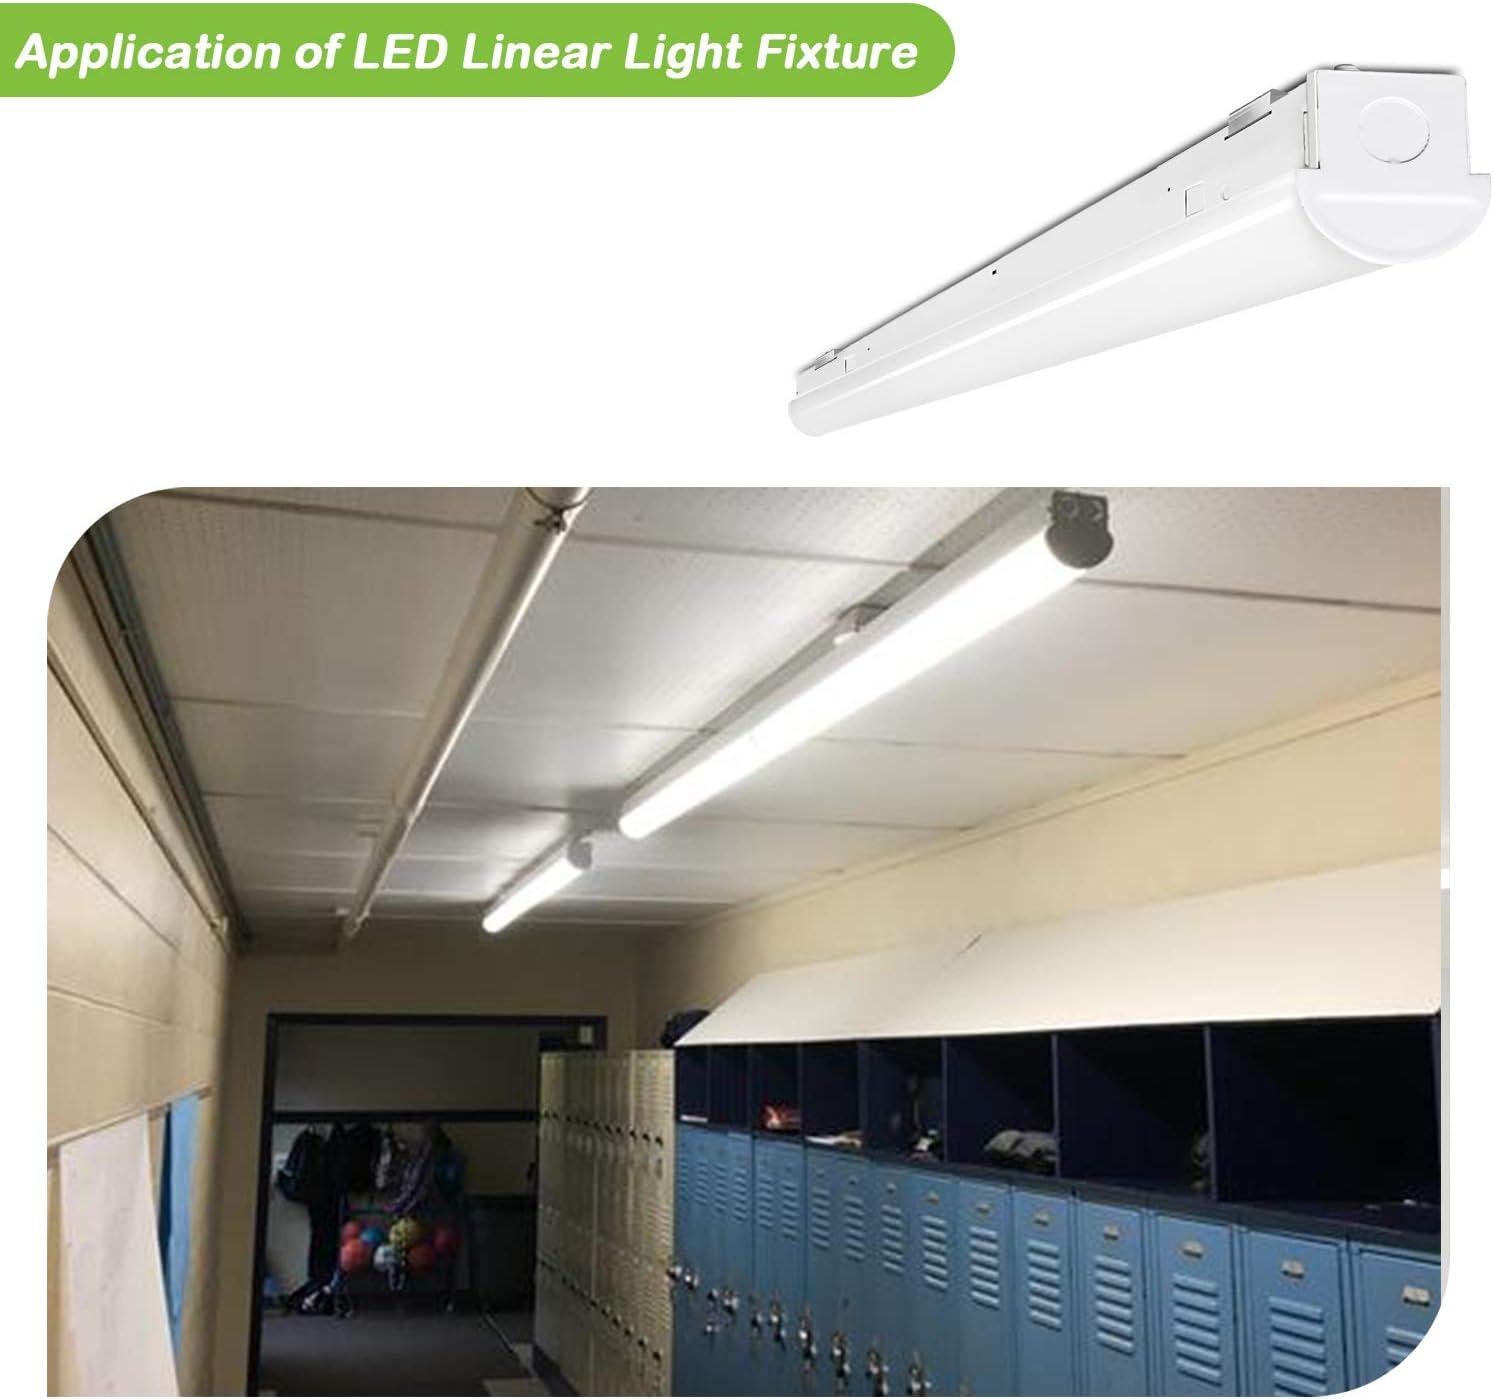 DLC Complied 5000K Daylight Hykolity 8FT LED Shop Light Commercial 8 Foot LED Strip Light Fixture -4 Pack 75W 9750LM Linkable LED Garage Light, 5-lamp F32T8 Fluorescent Equiv. 0-10V Dimmable